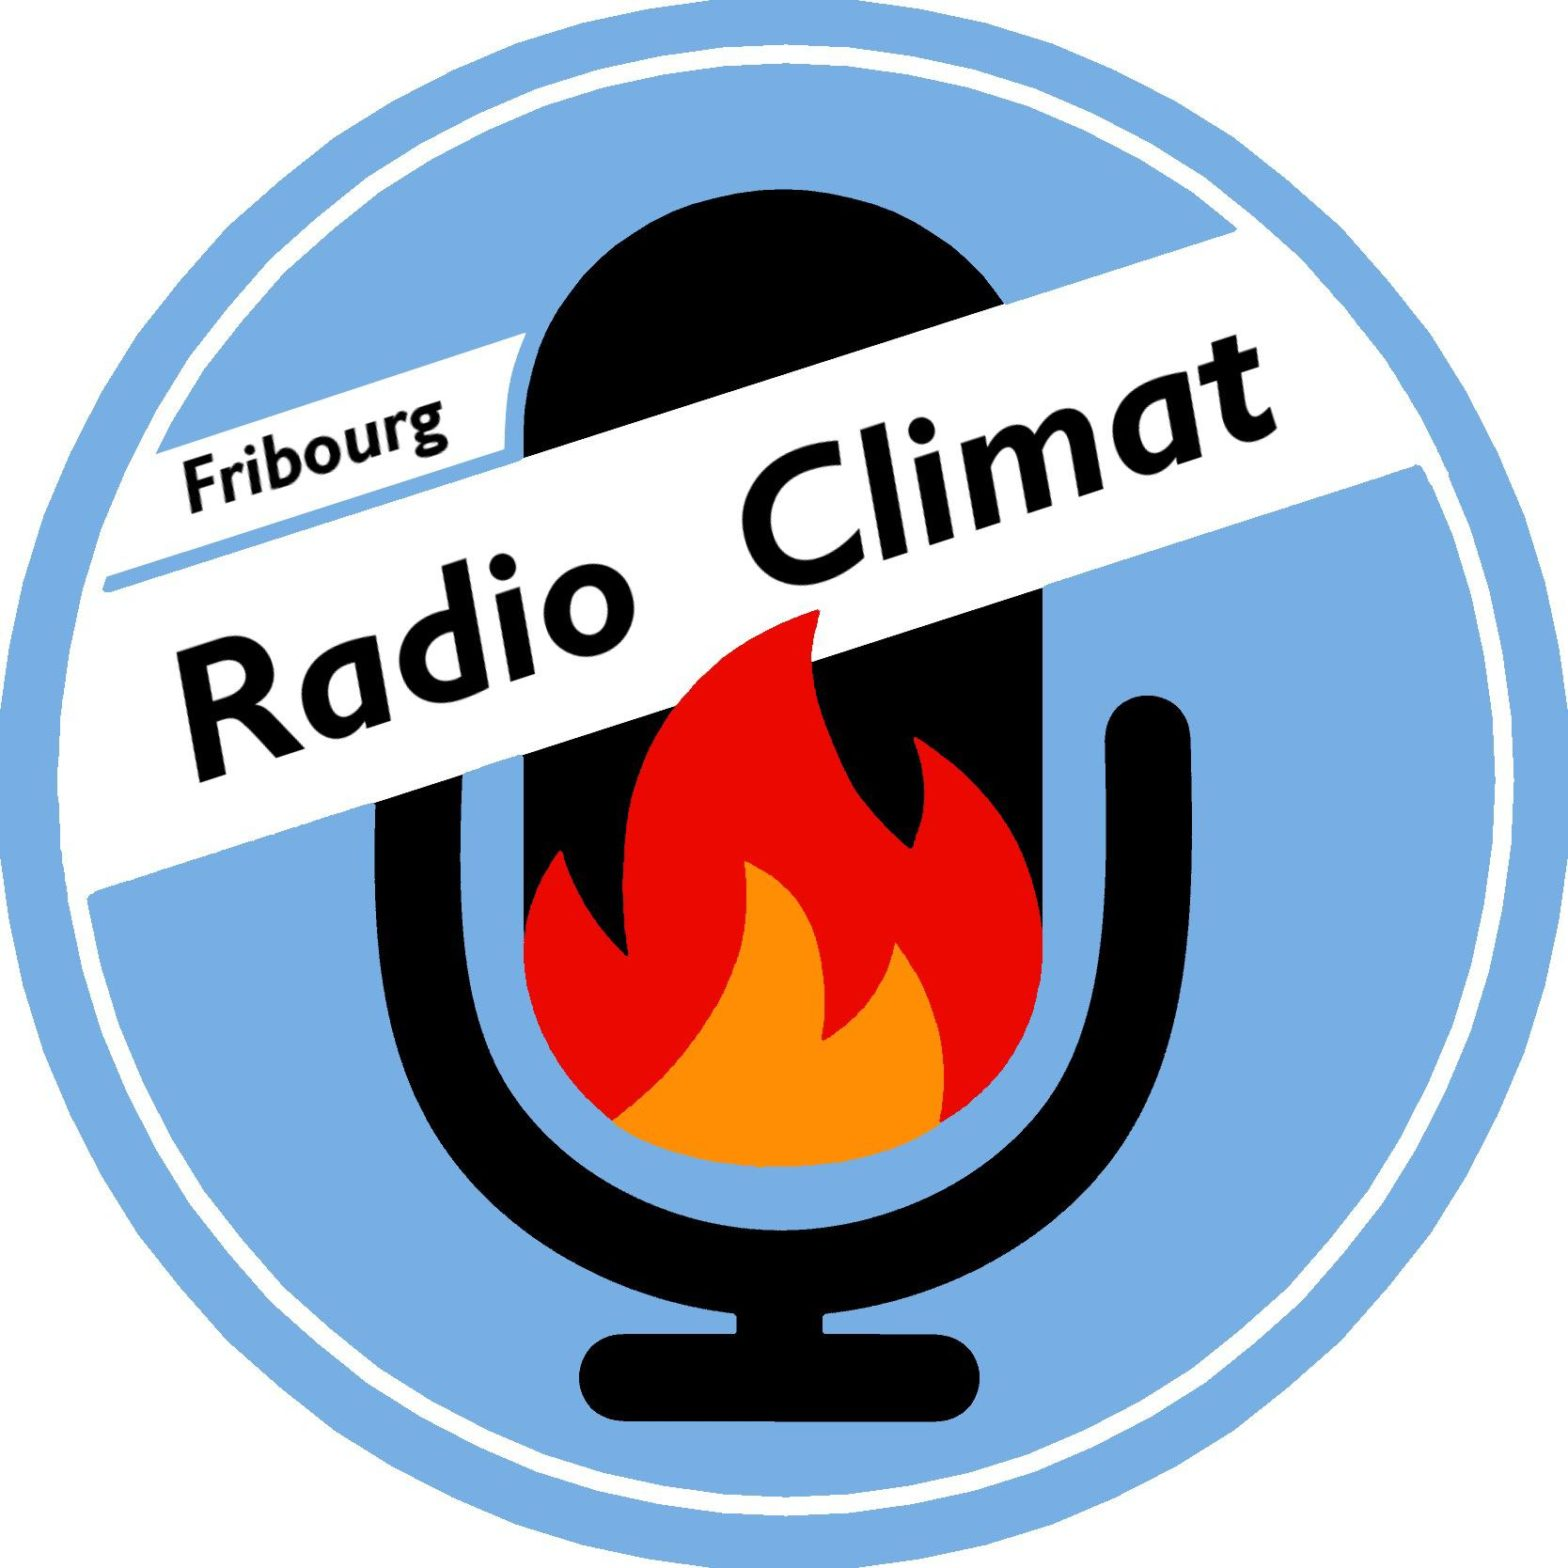 Radio Climat